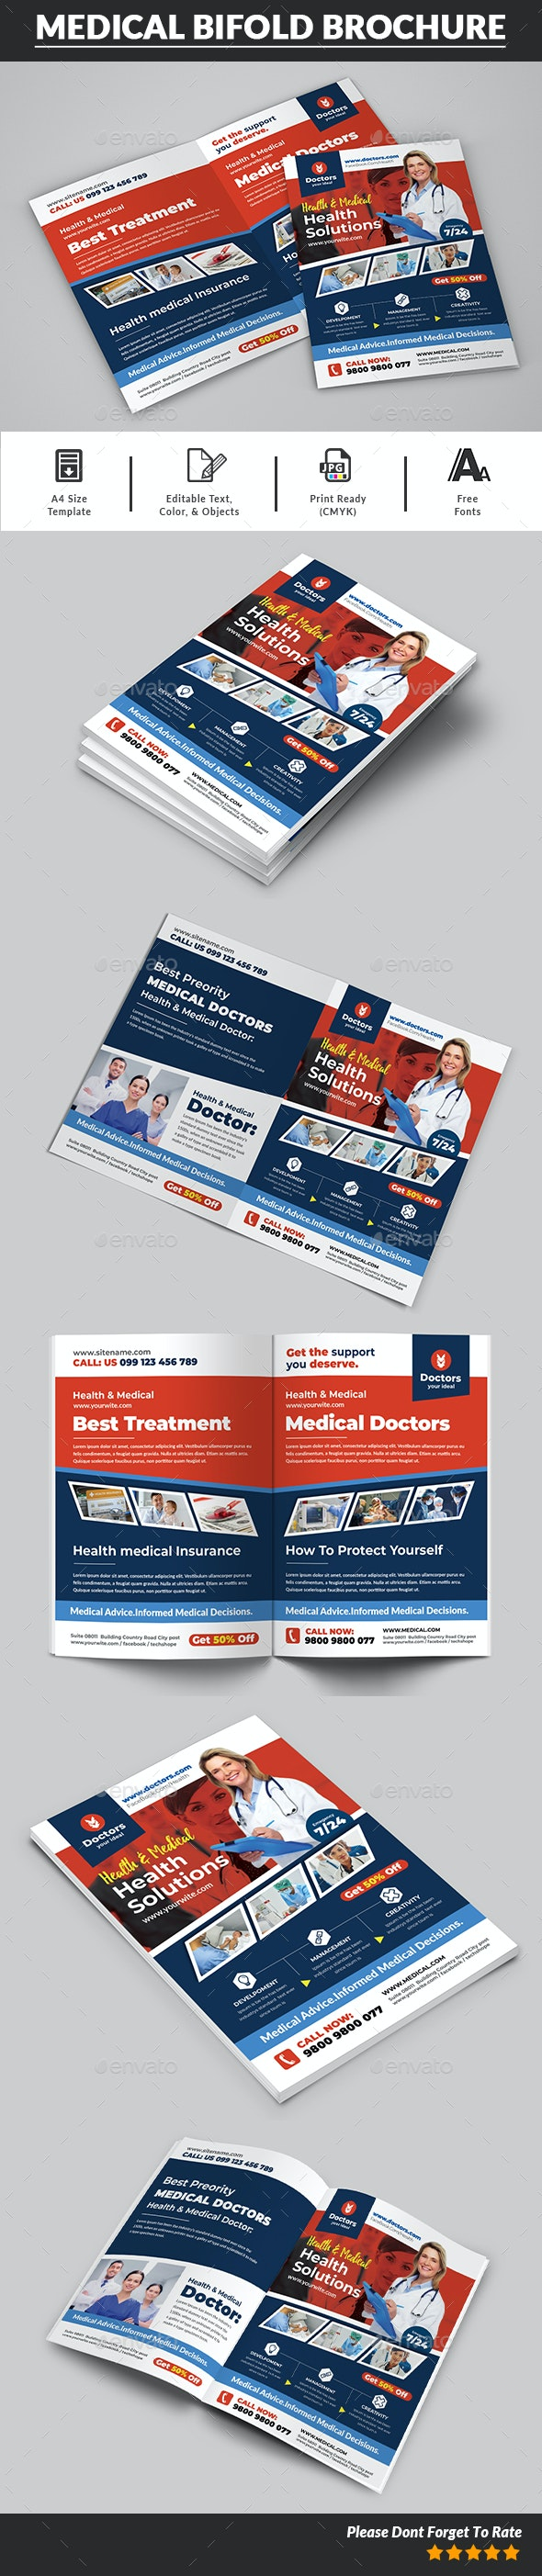 Health & Medical Doctors Bifold Brochure - Brochures Print Templates